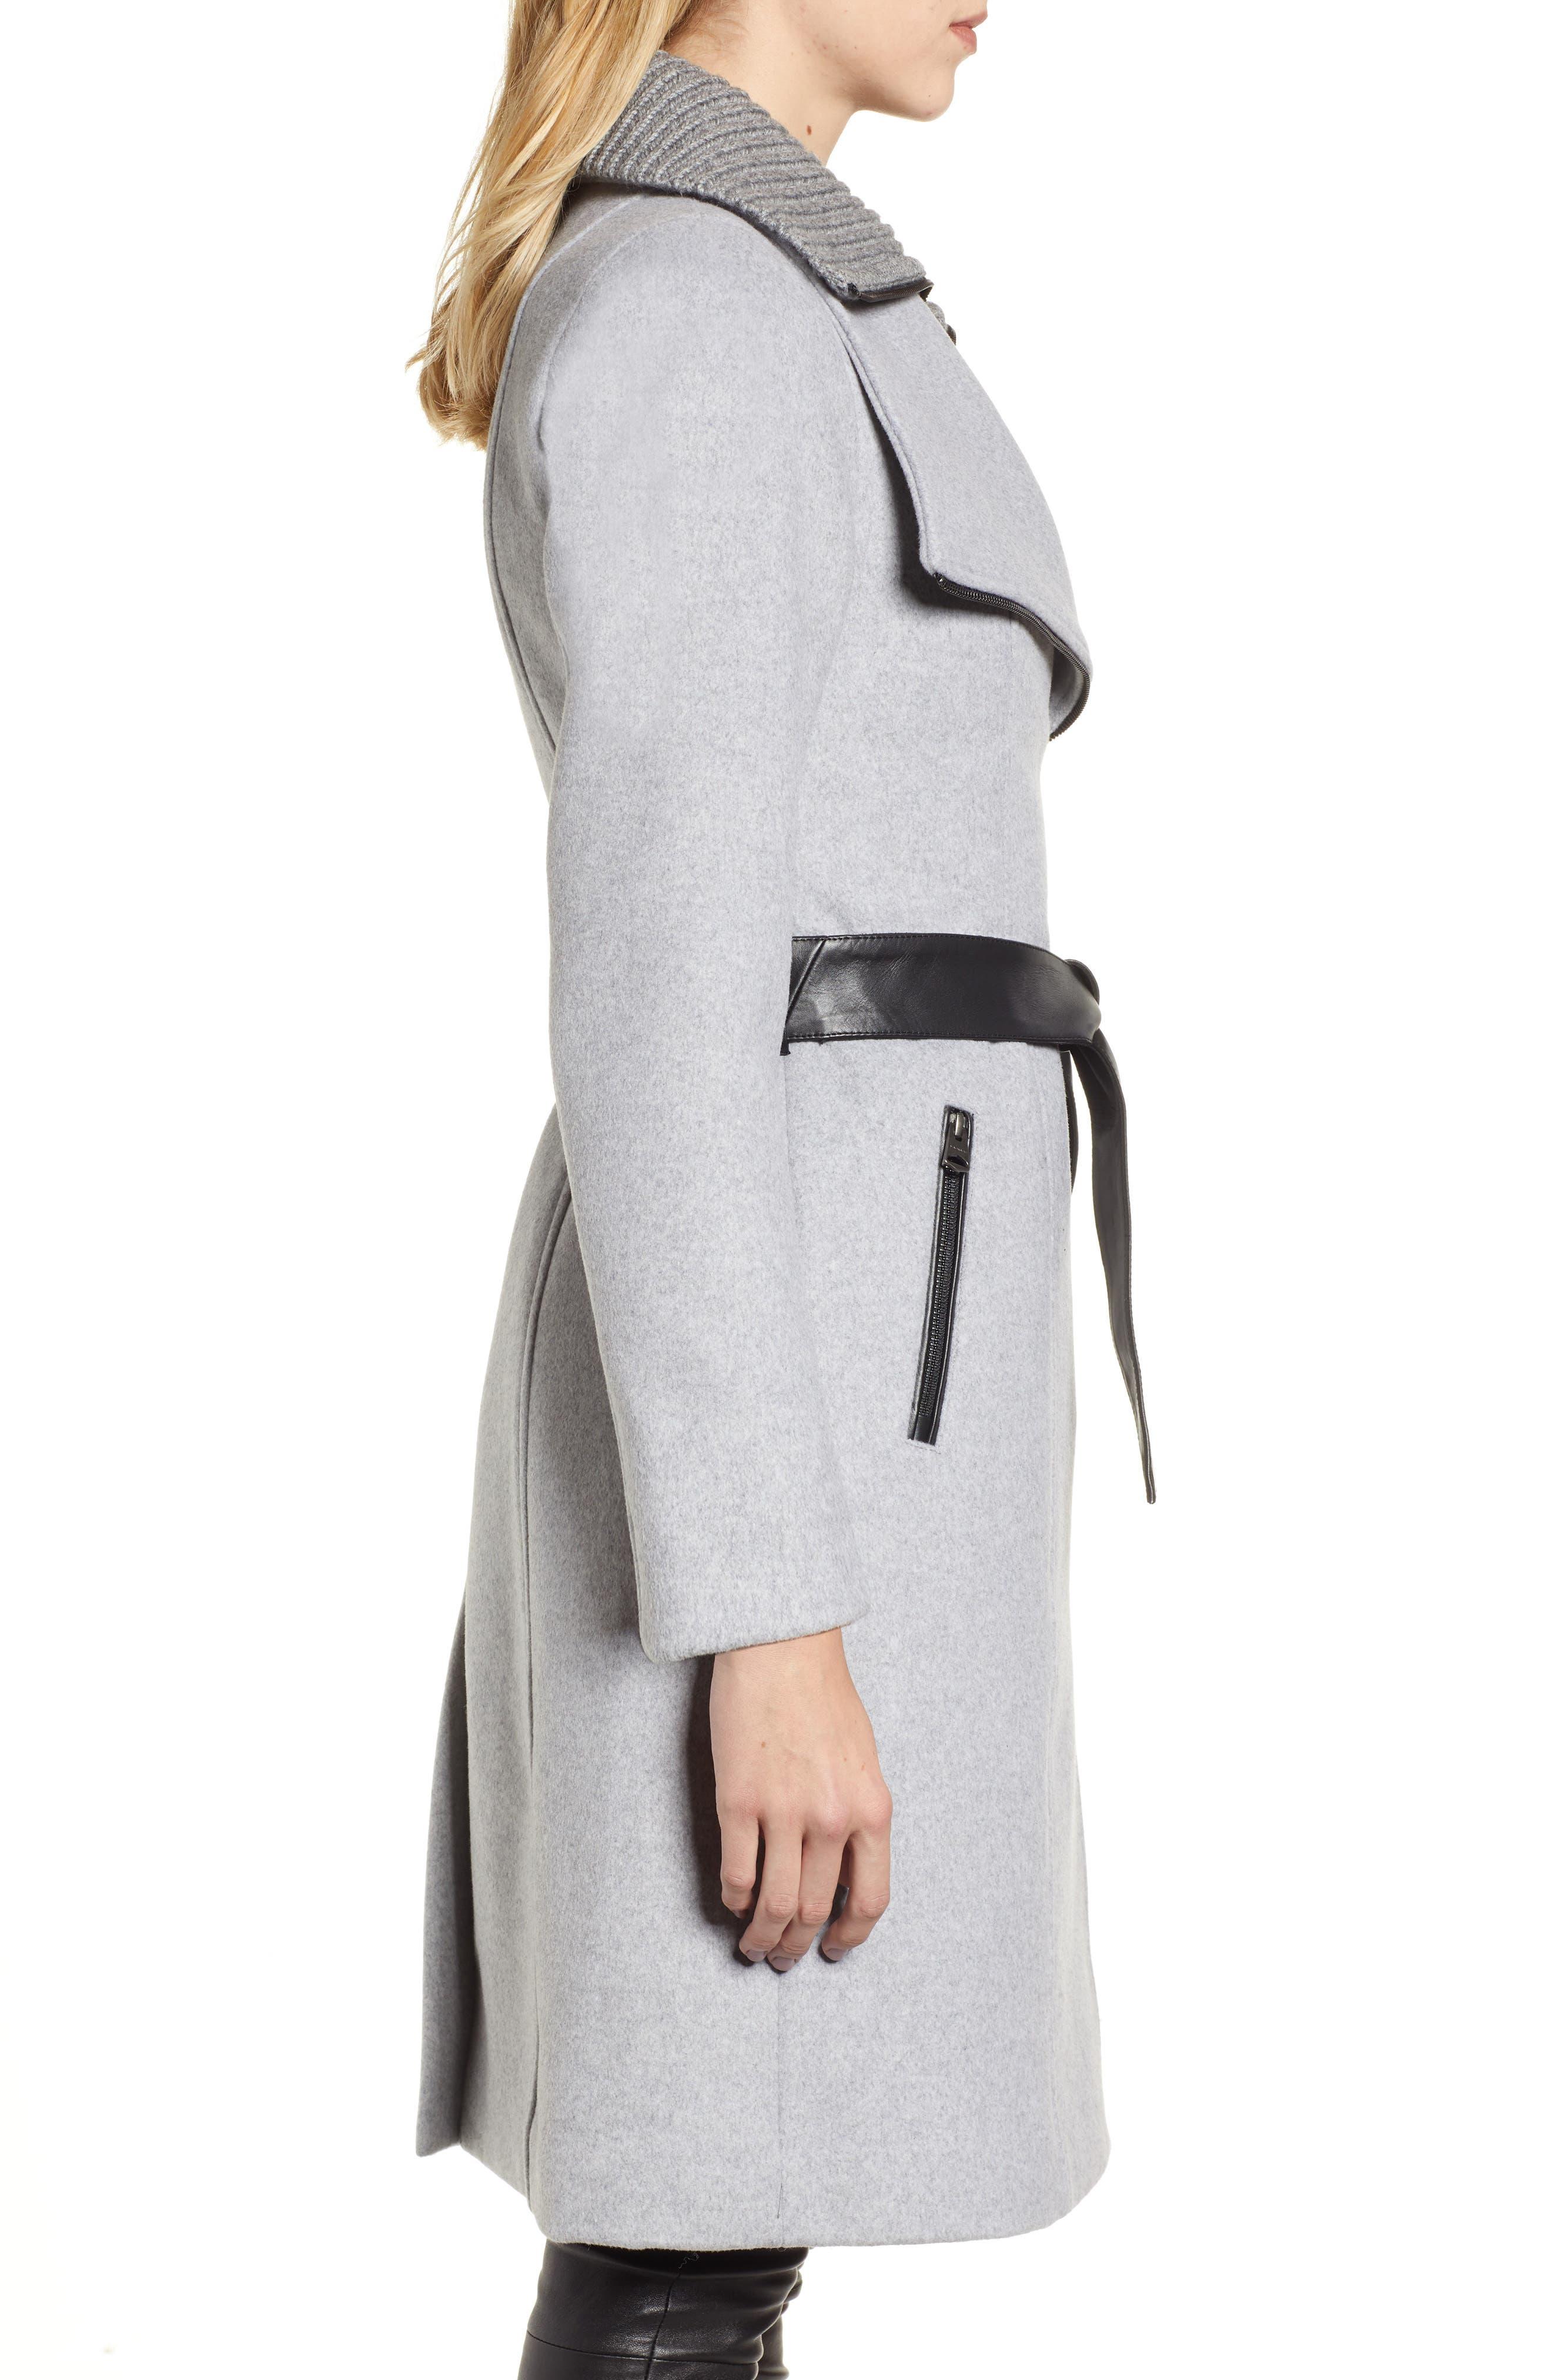 MACKAGE, Nori Belted Wool Blend Coat, Alternate thumbnail 4, color, LIGHT GREY